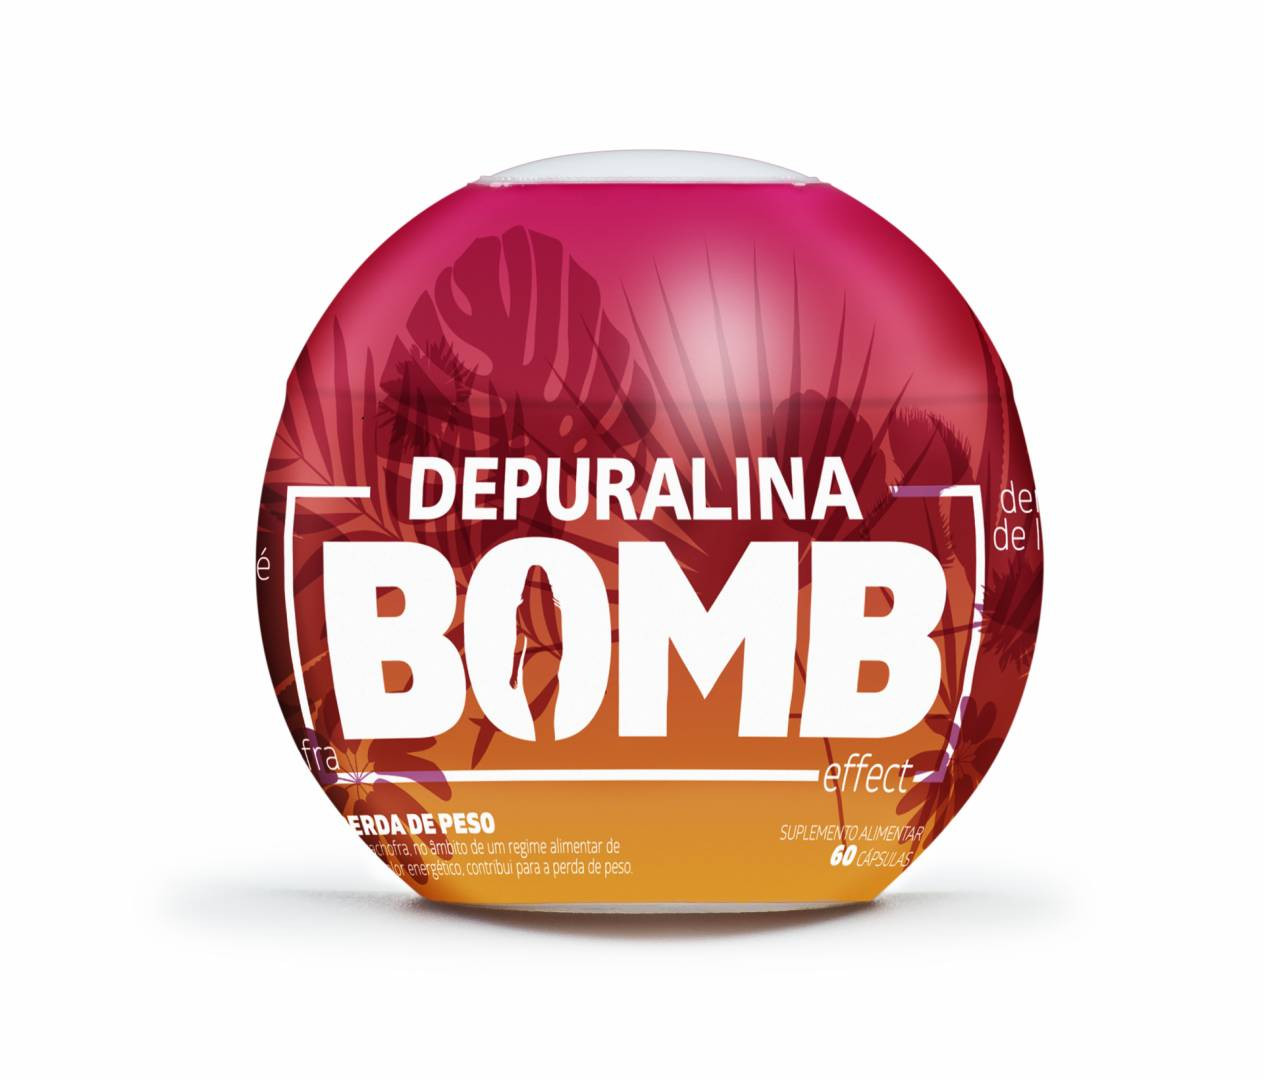 DEPURALINA BOMBEFFECT CAPS X60 BOLA